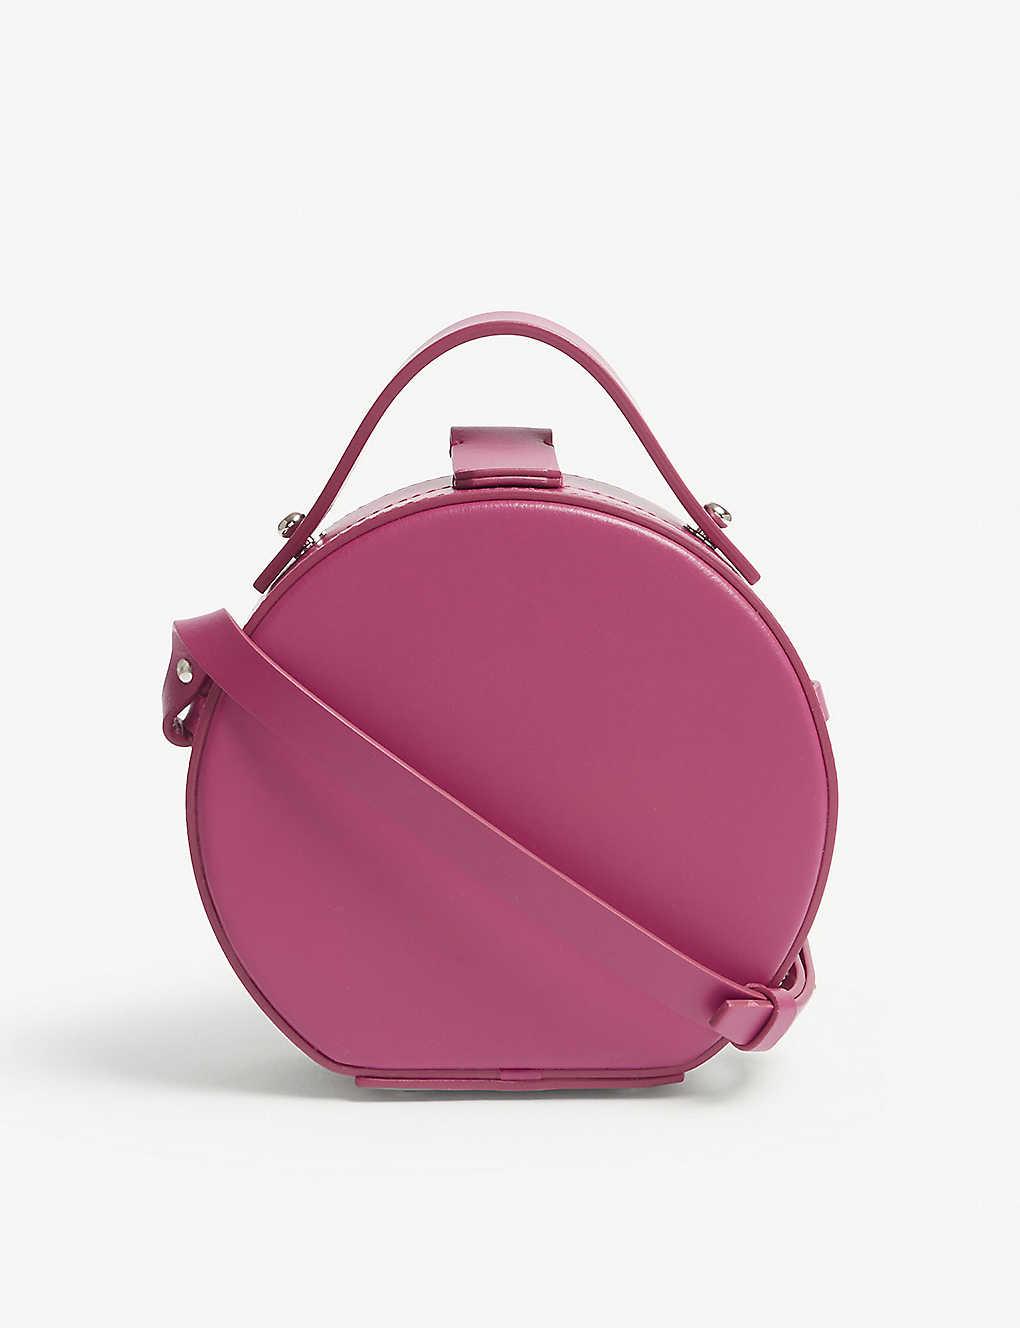 NIco Giani round bag